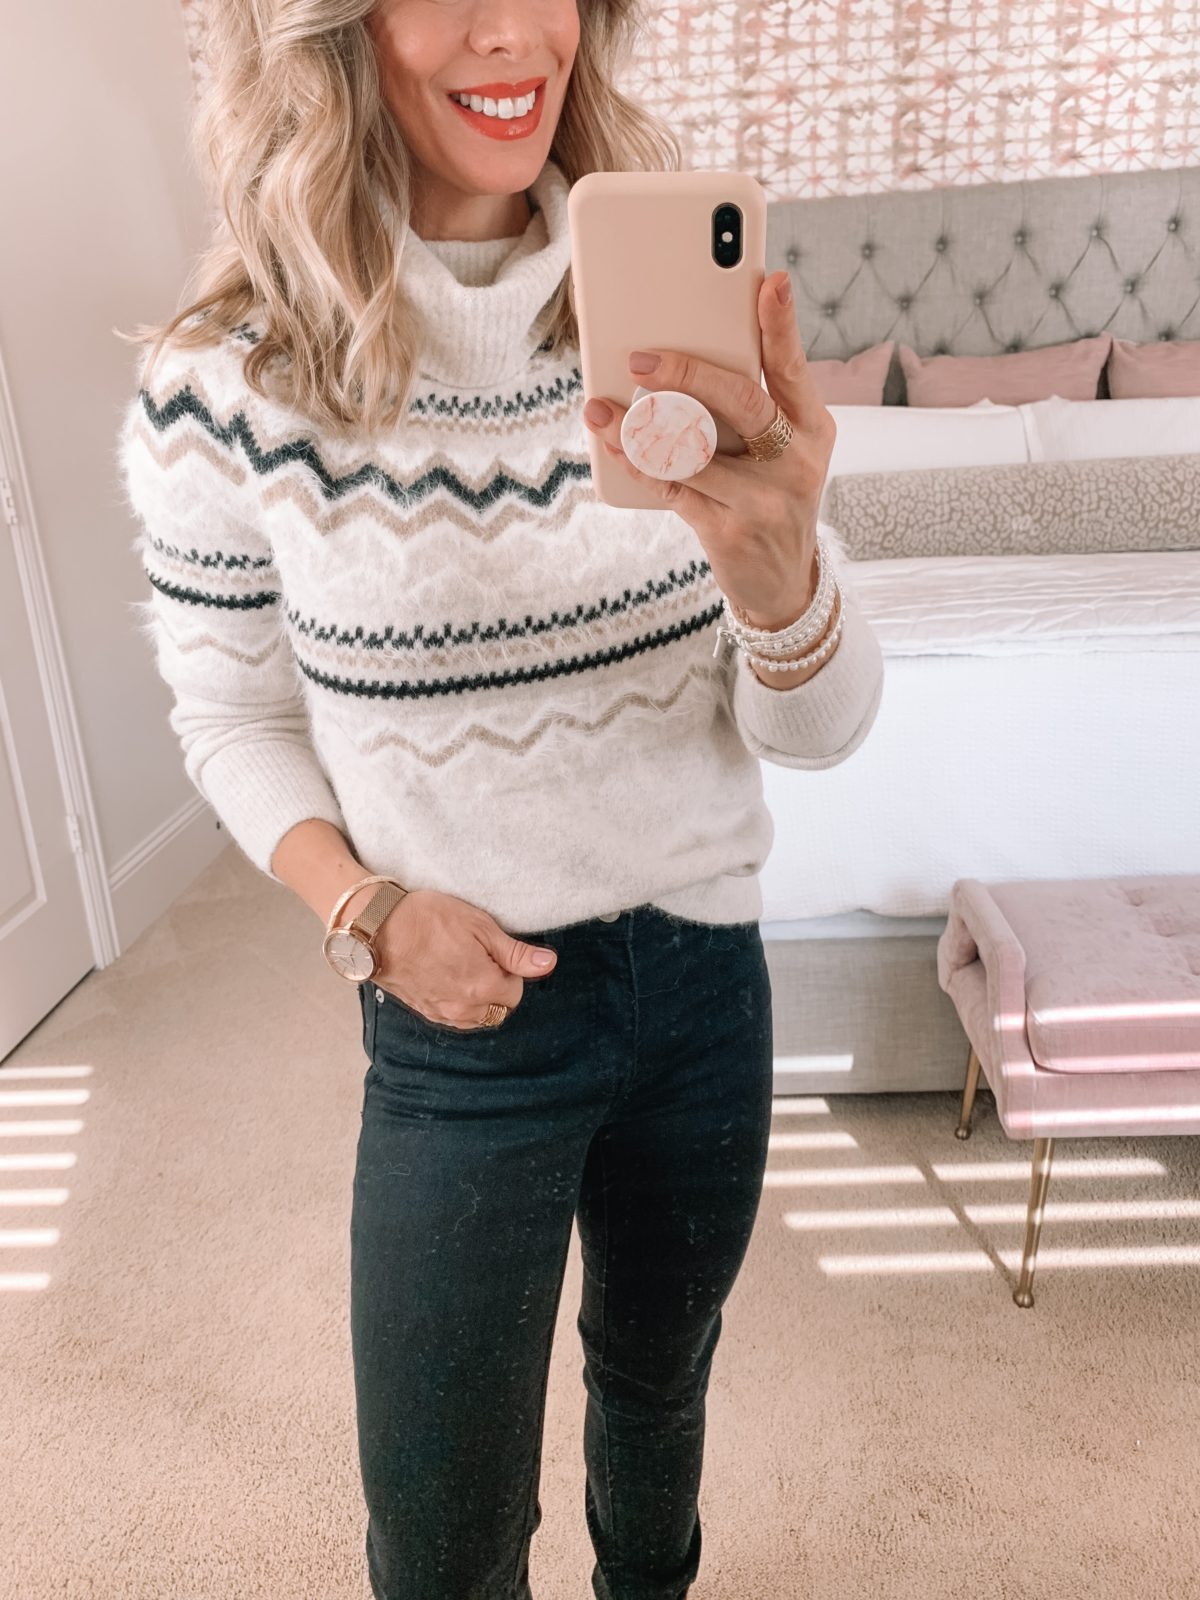 Dressing Room Try On LOFT, Nordstrom, Fair Isle Sweater, Jeans